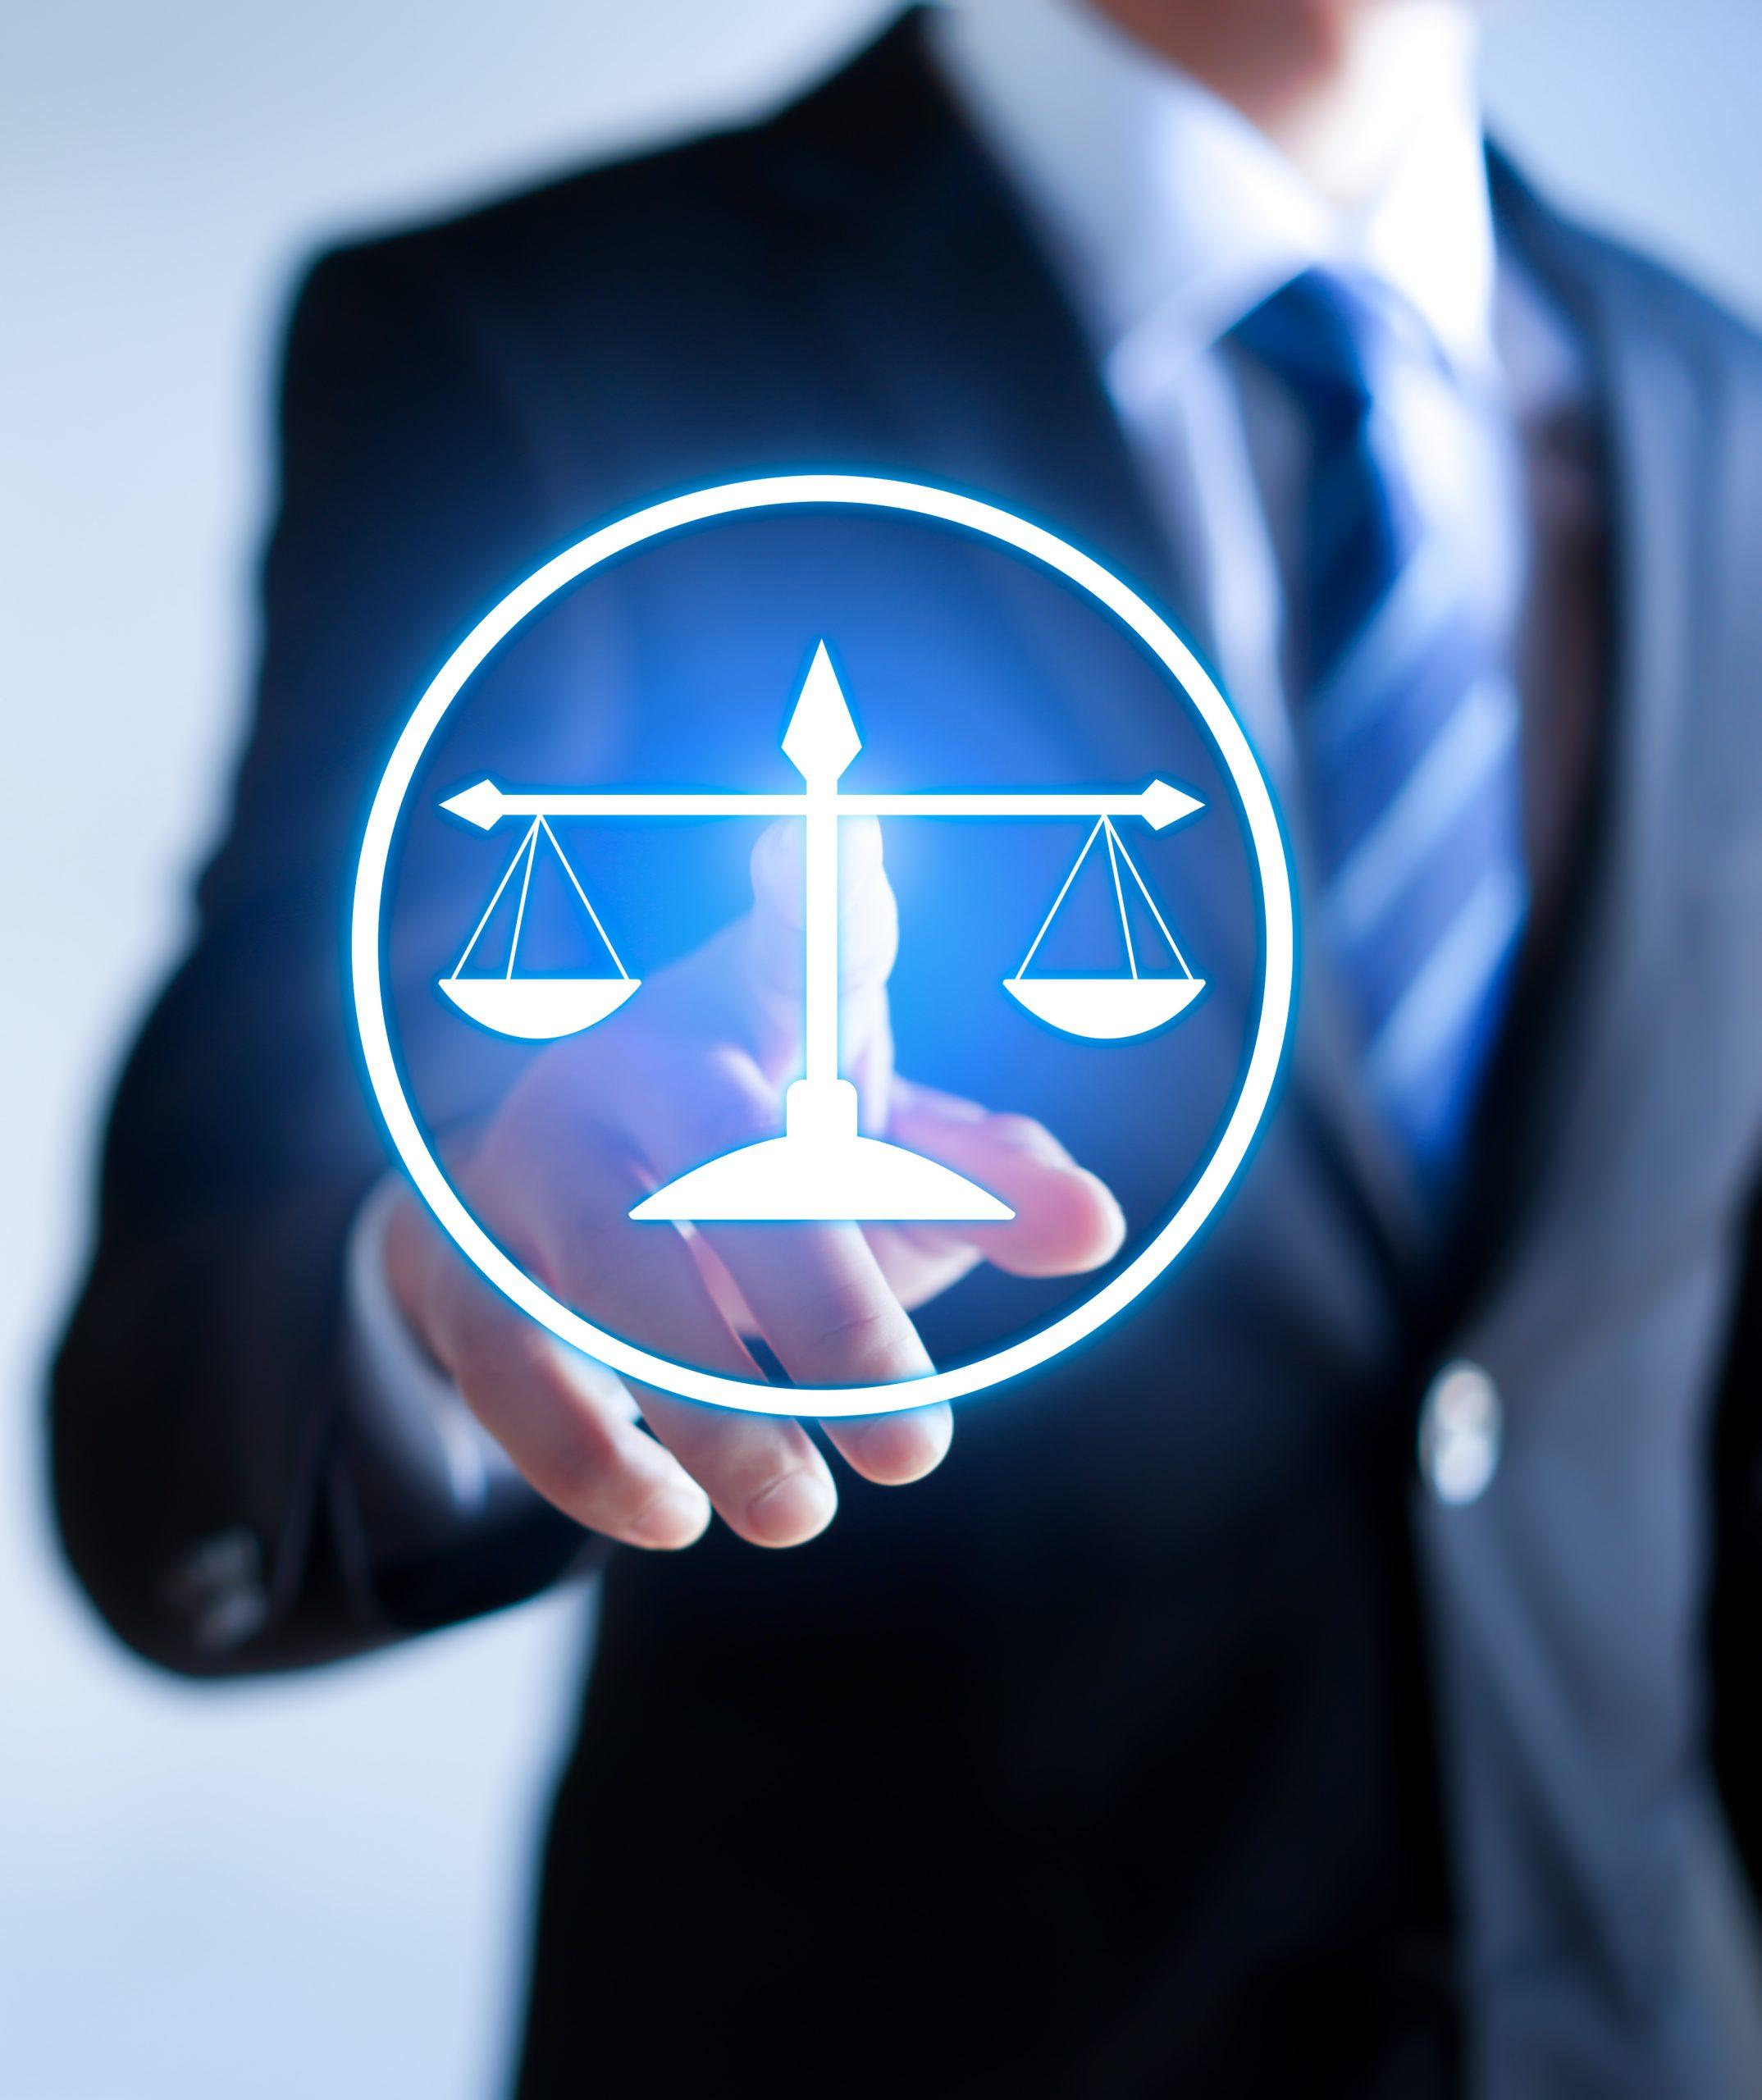 Justice Law Criminal Lawyer